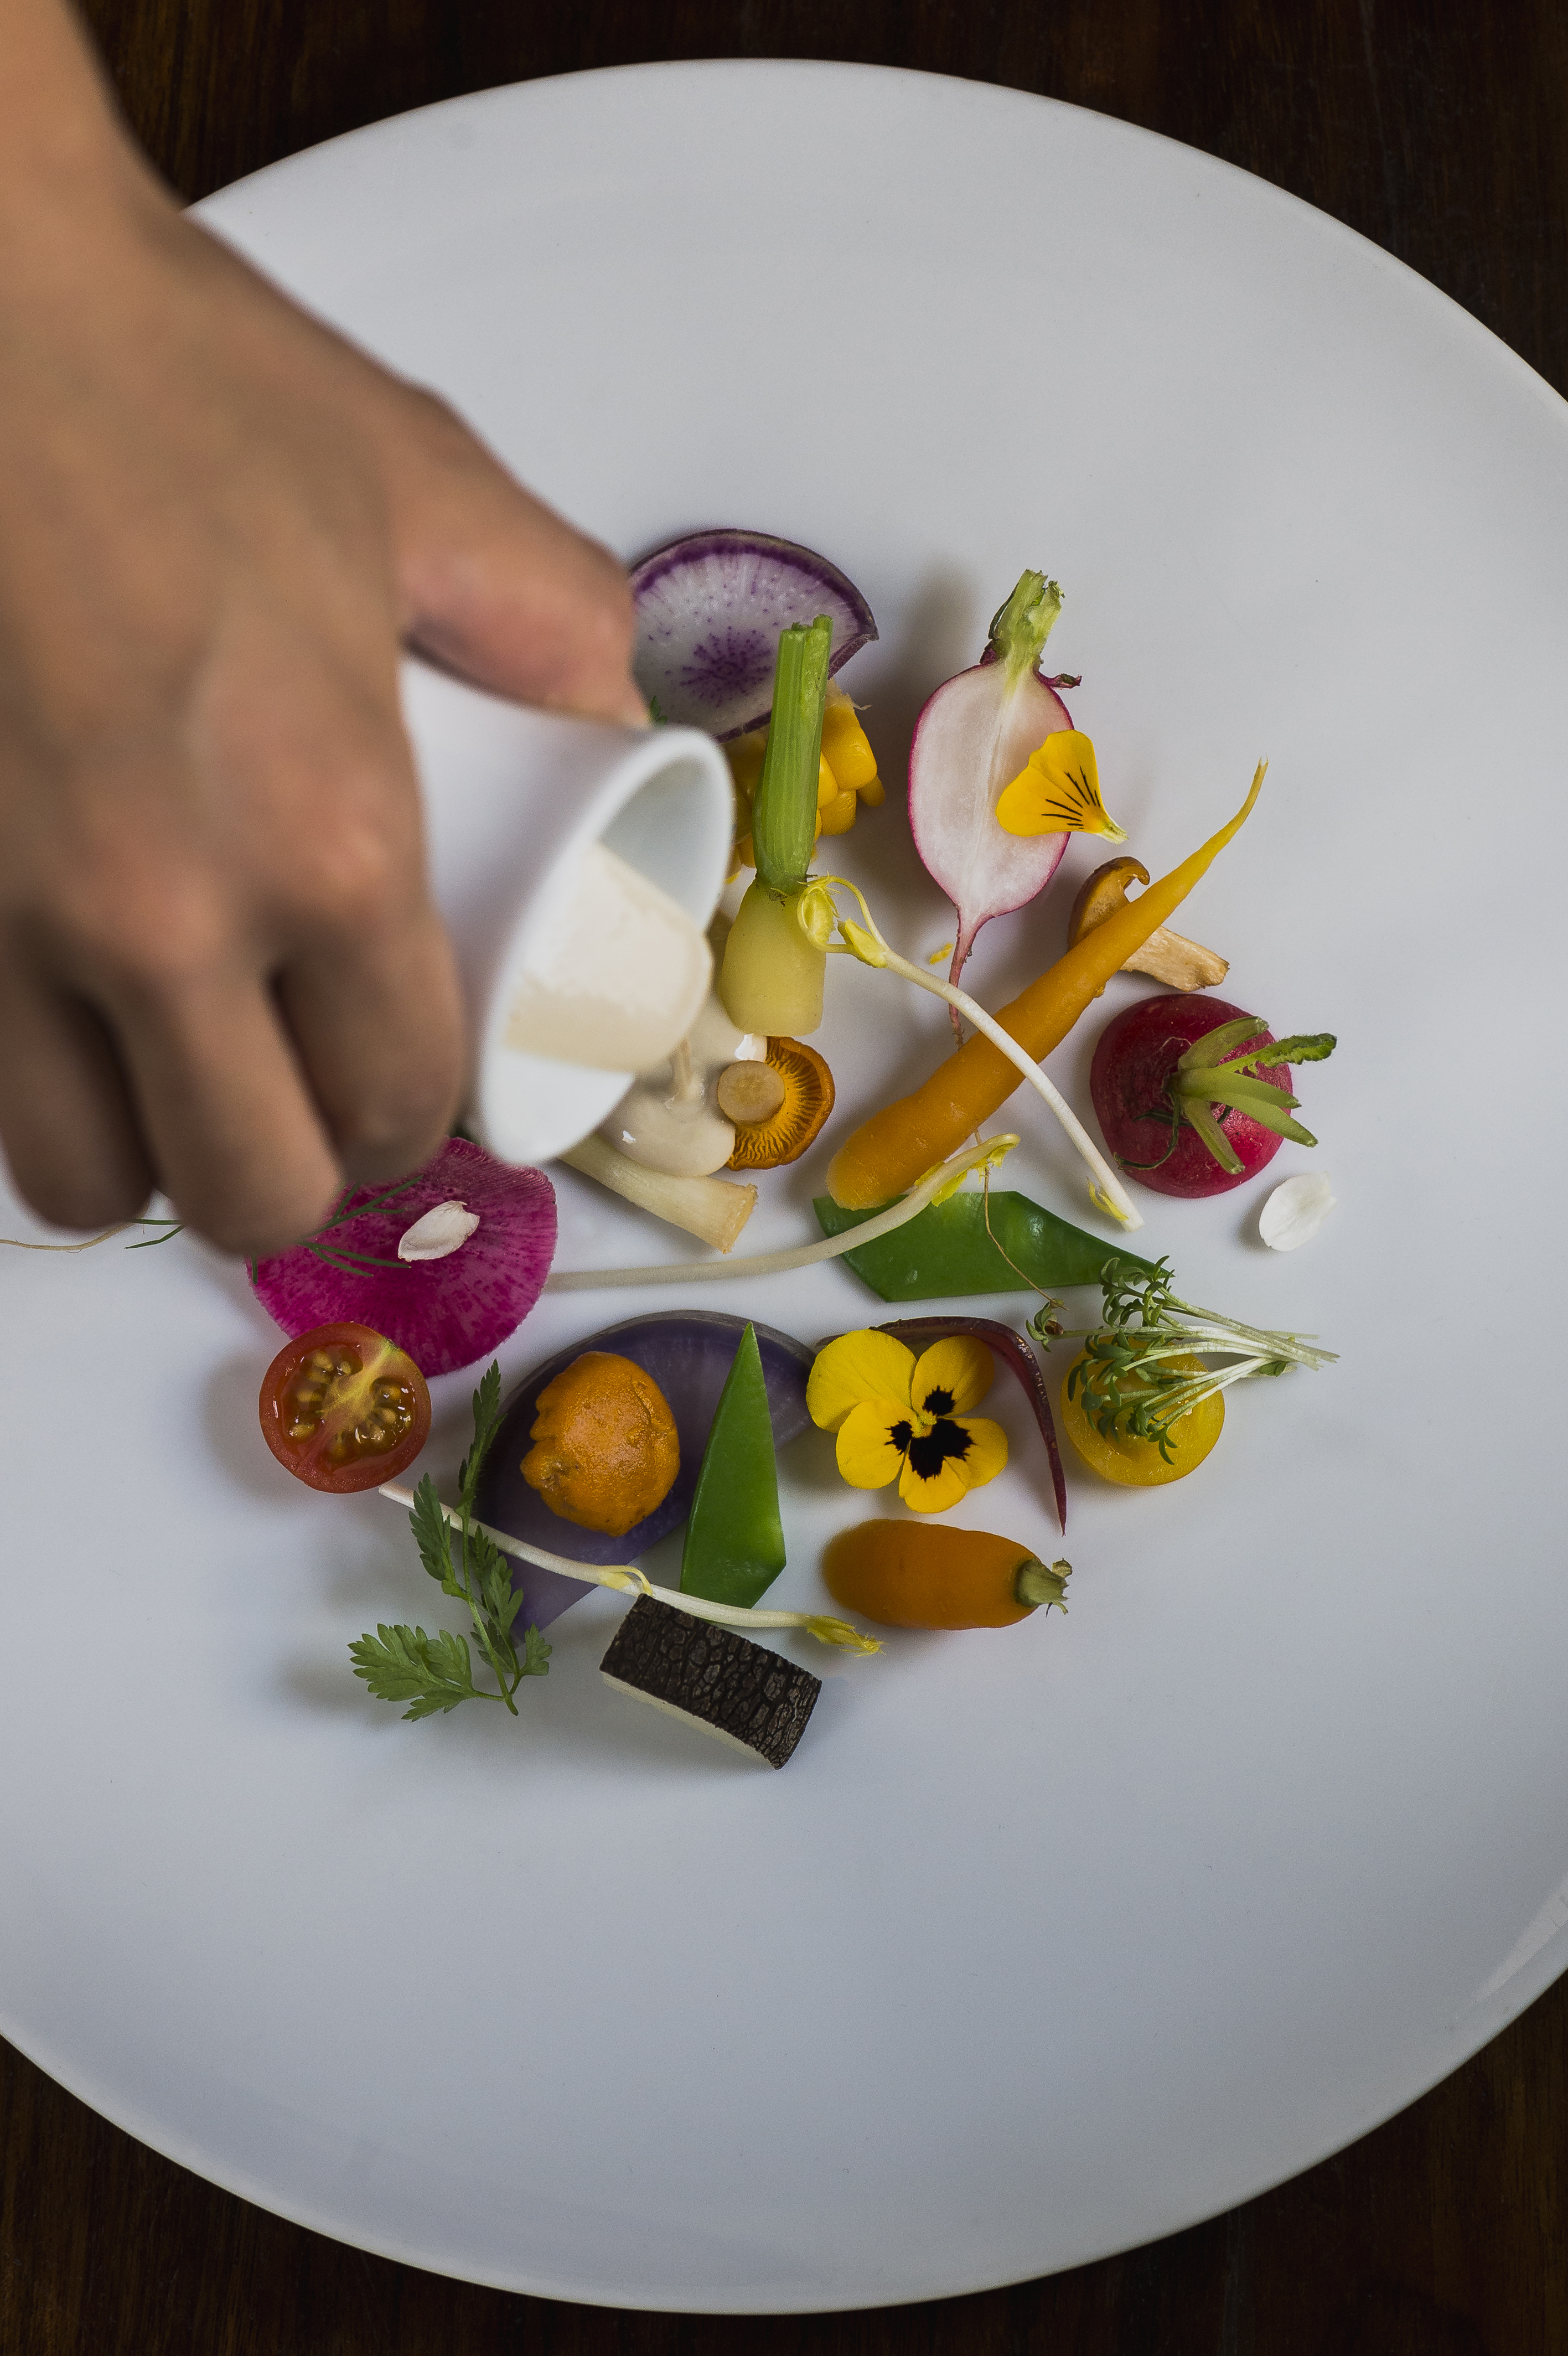 Restaurant Automne. Restaurant étoilé Michelin